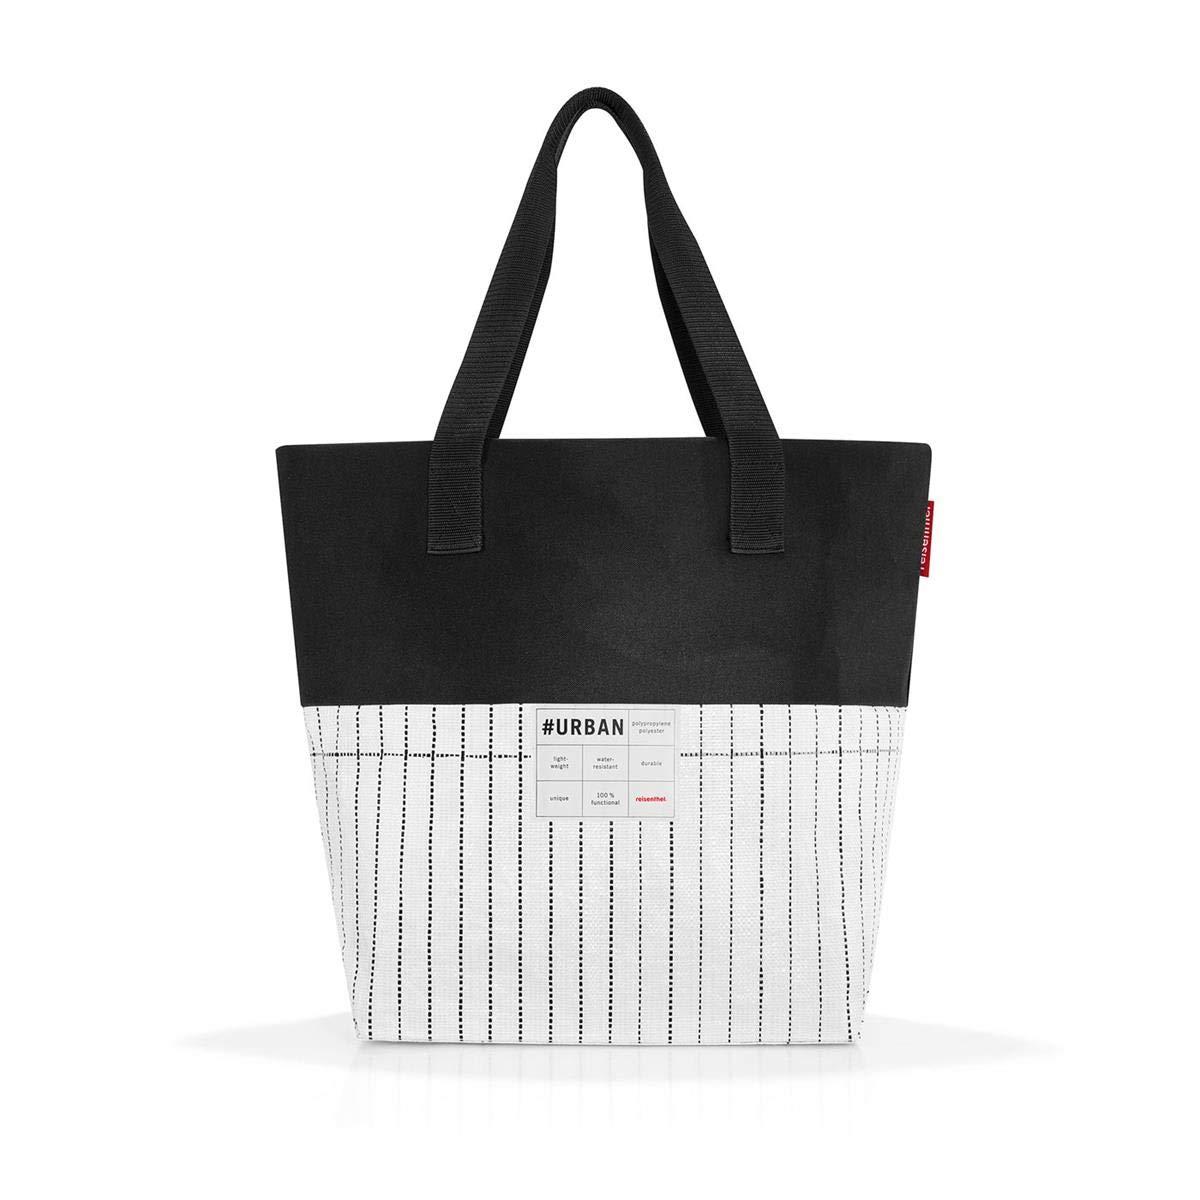 Reisenthel Urban Sac de Sport Grand Format, 48 cm, 15 liters, Multicolore (Black White)